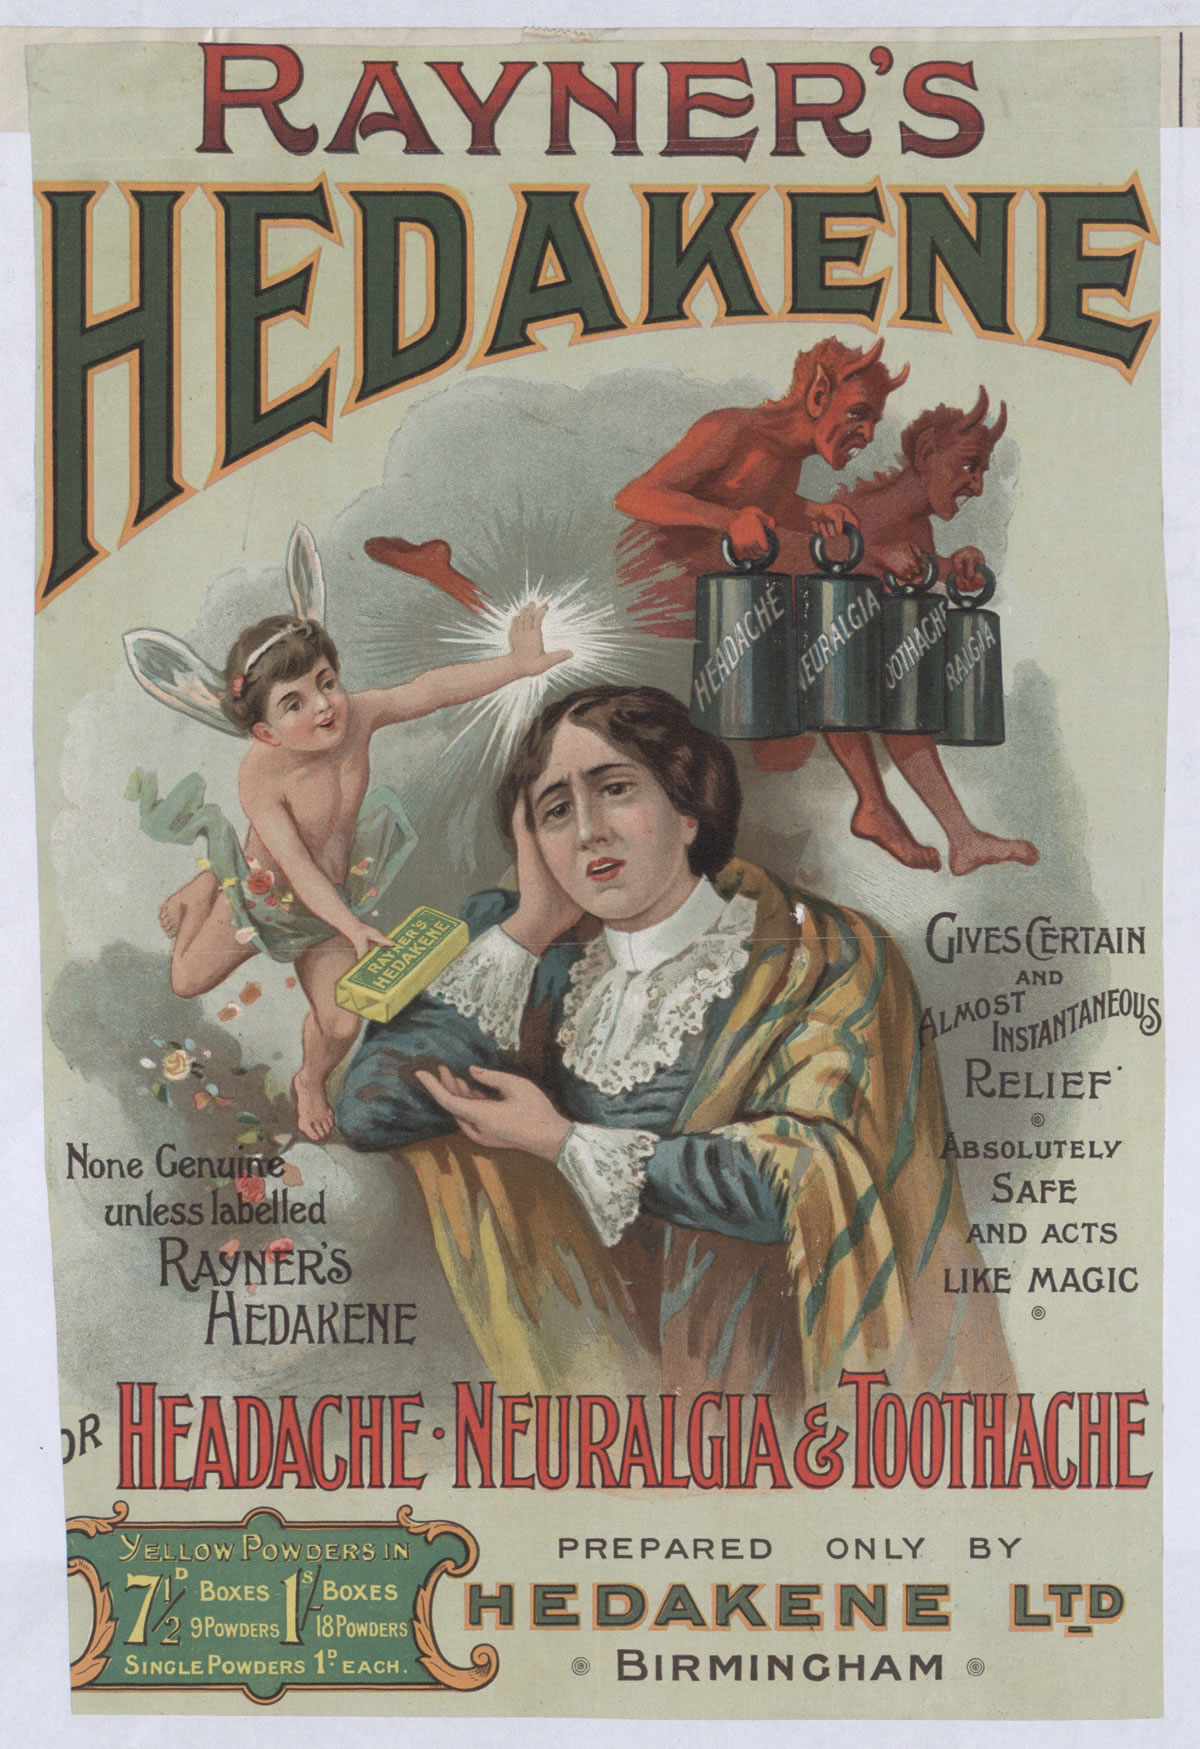 Advertisement for Rayner's Hedakene powder, 1901 (COPY 1/176 f.182)